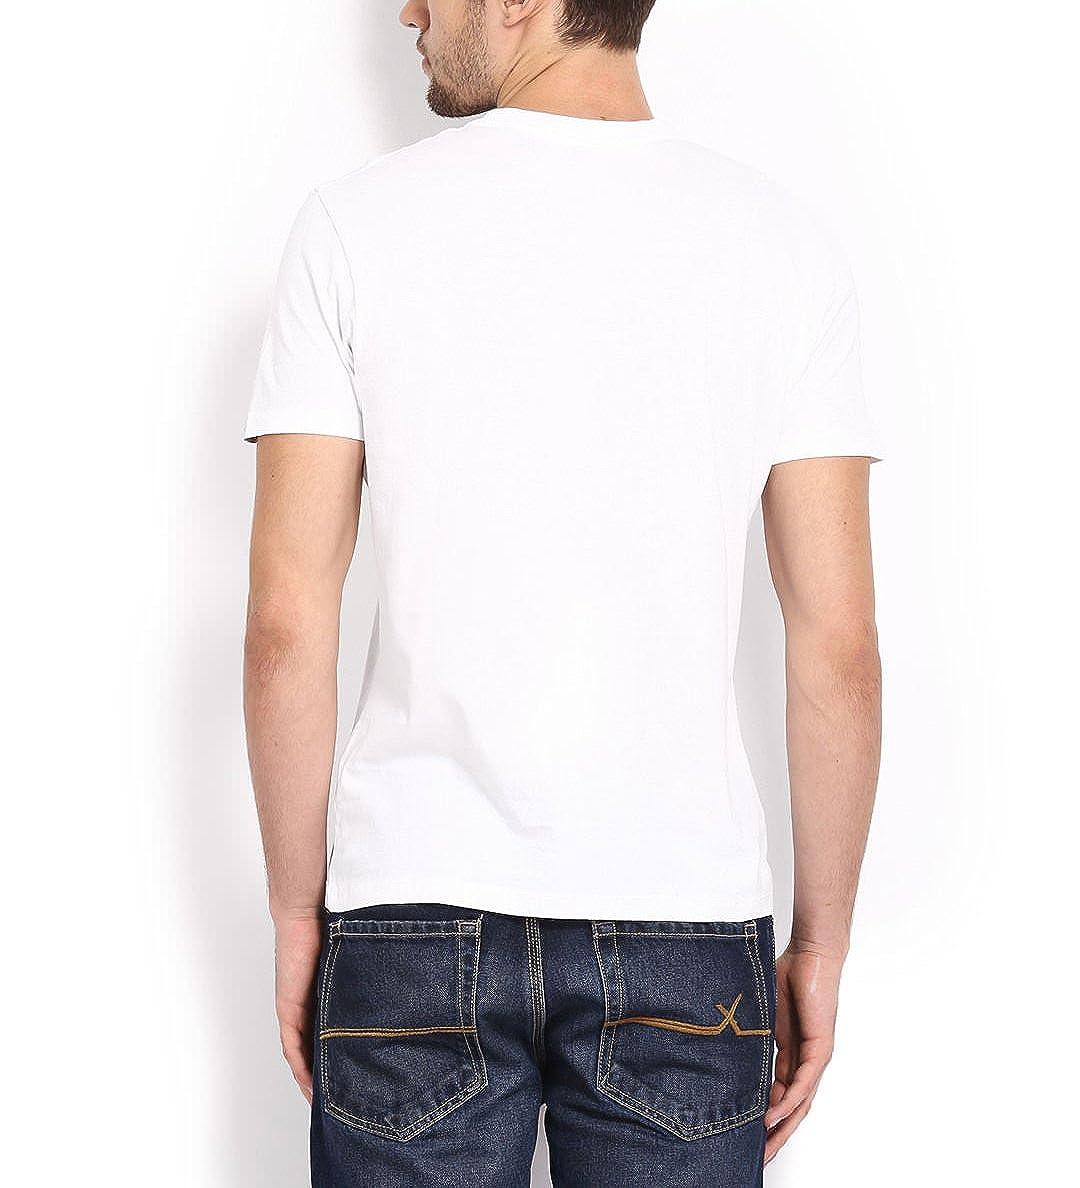 c8903360 Canis Mooch Nahi toh Kuch Nahi Beard   Round Neck   Typographic:Slogan Tee    Men's White T-Shirt: Amazon.in: Clothing & Accessories